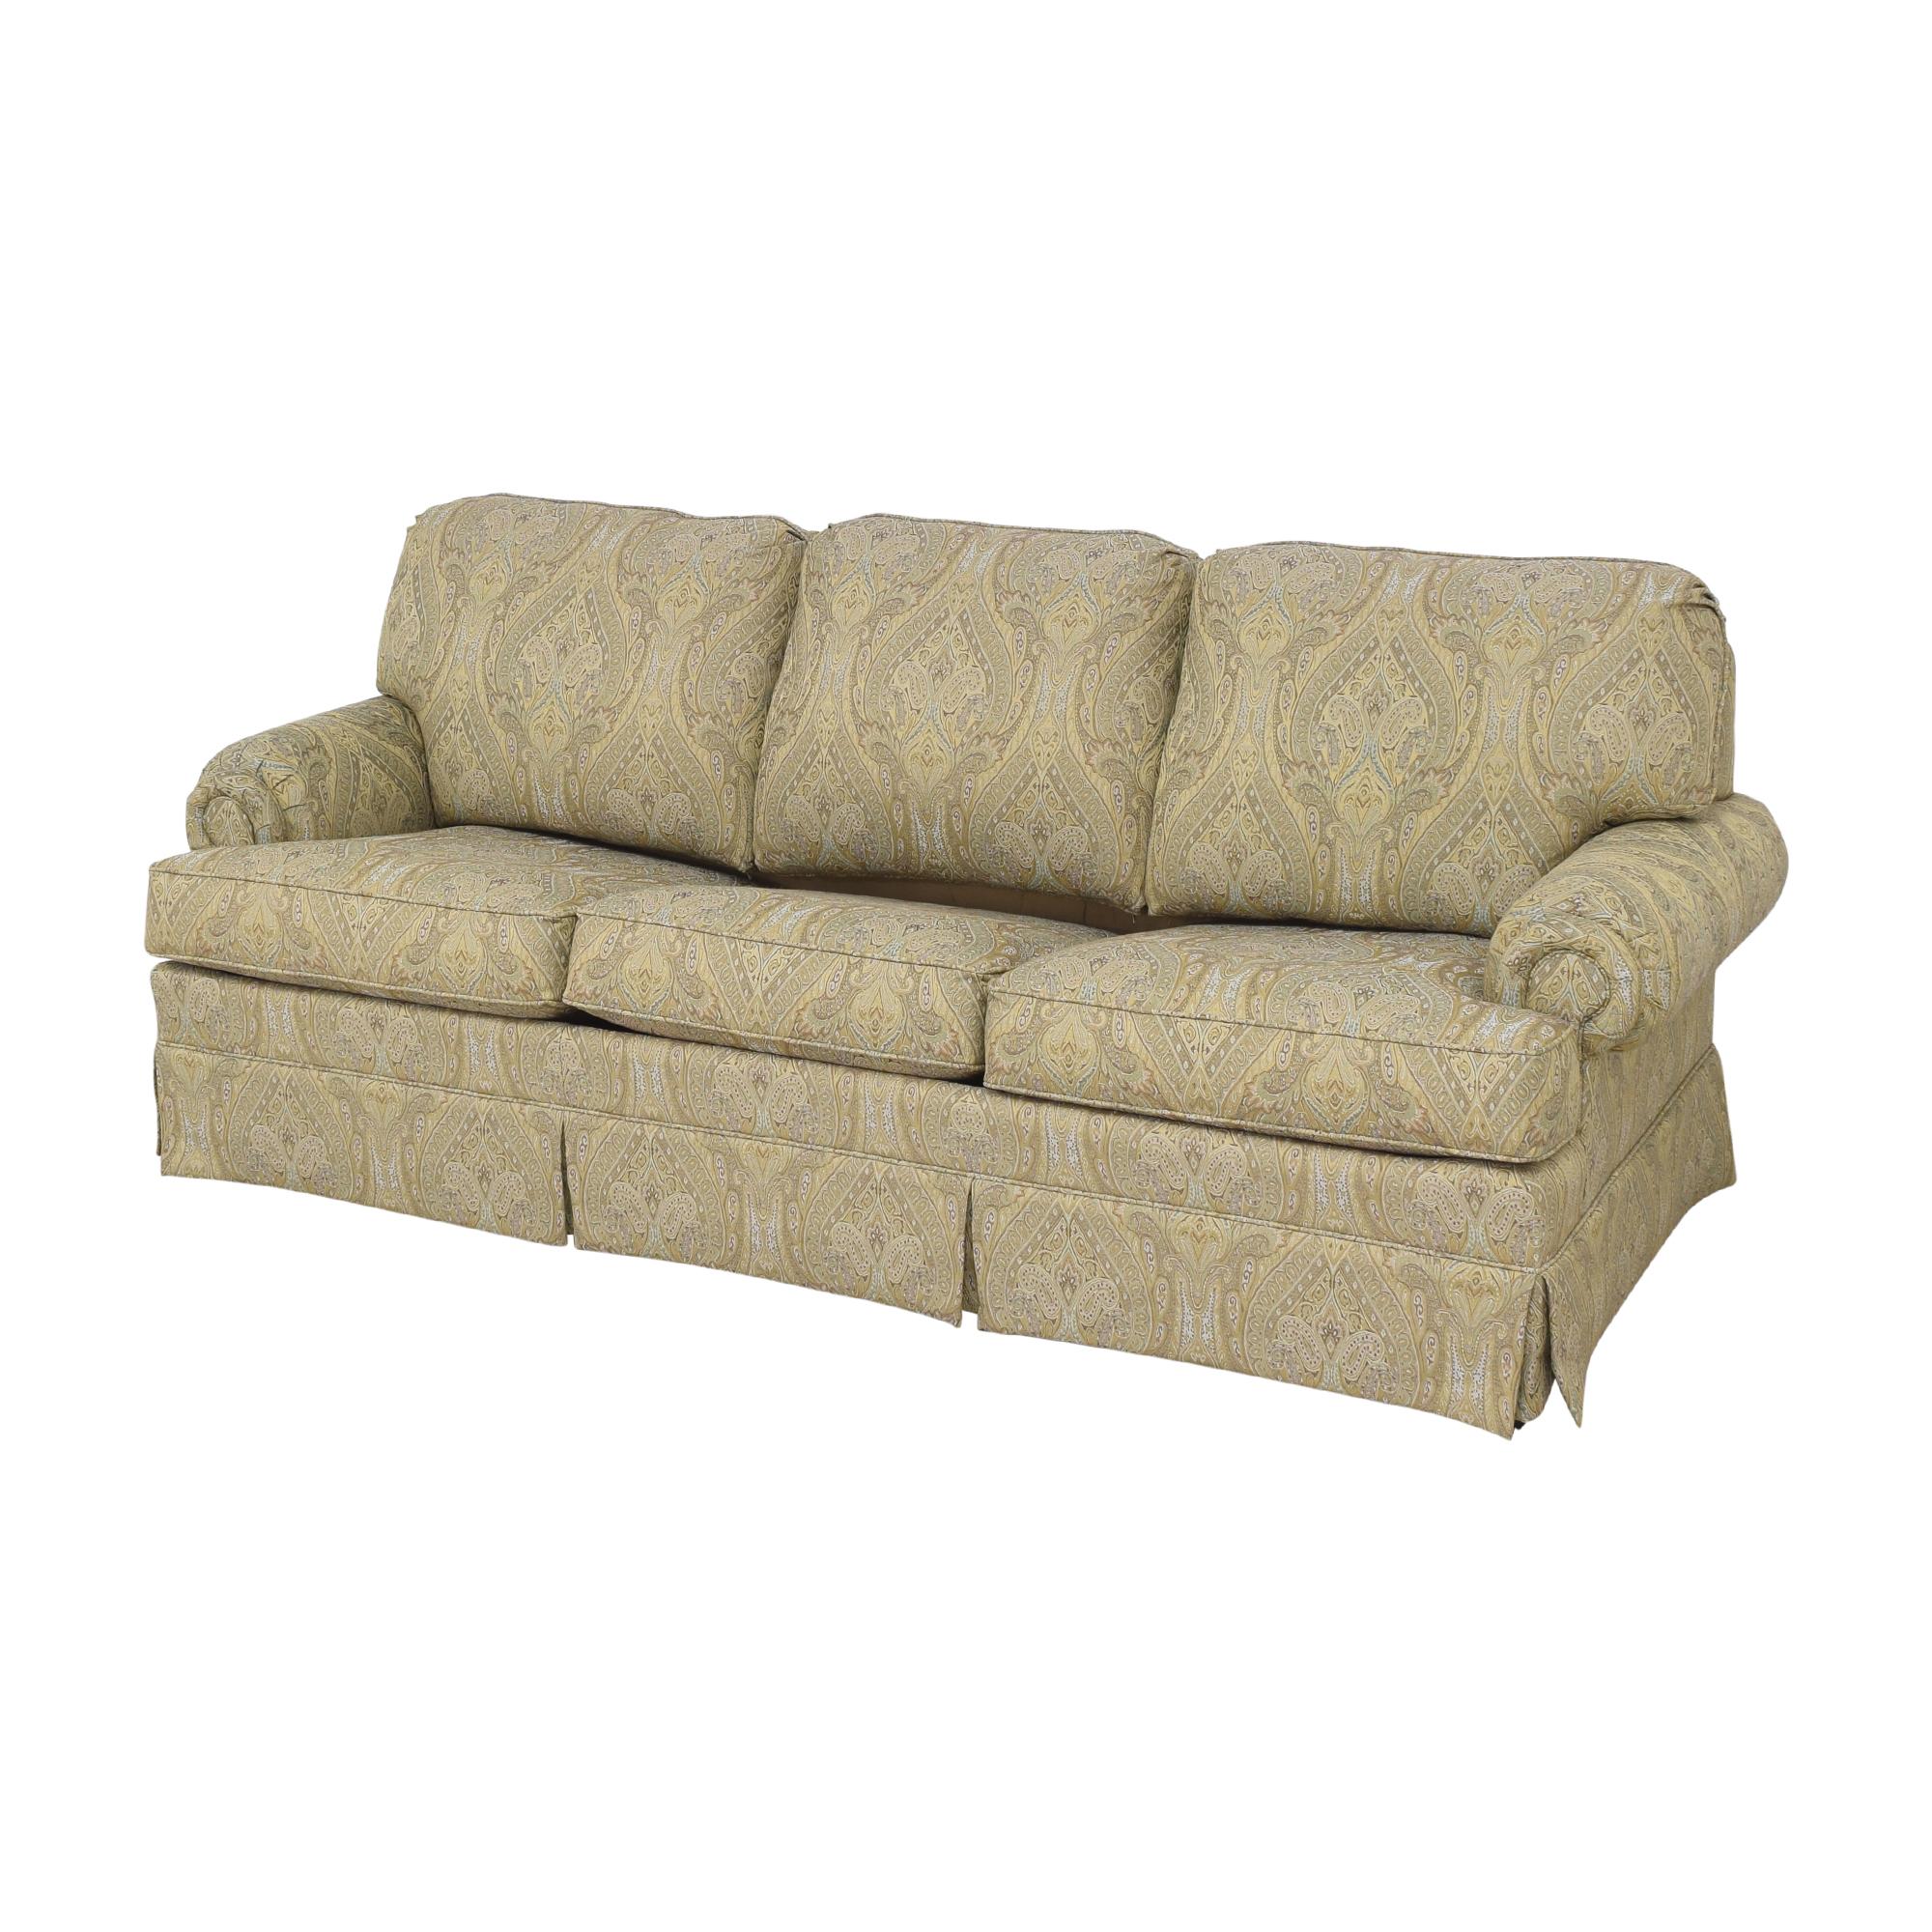 Thomasville Thomasville Paisley Three Cushion Sleeper Sofa dimensions